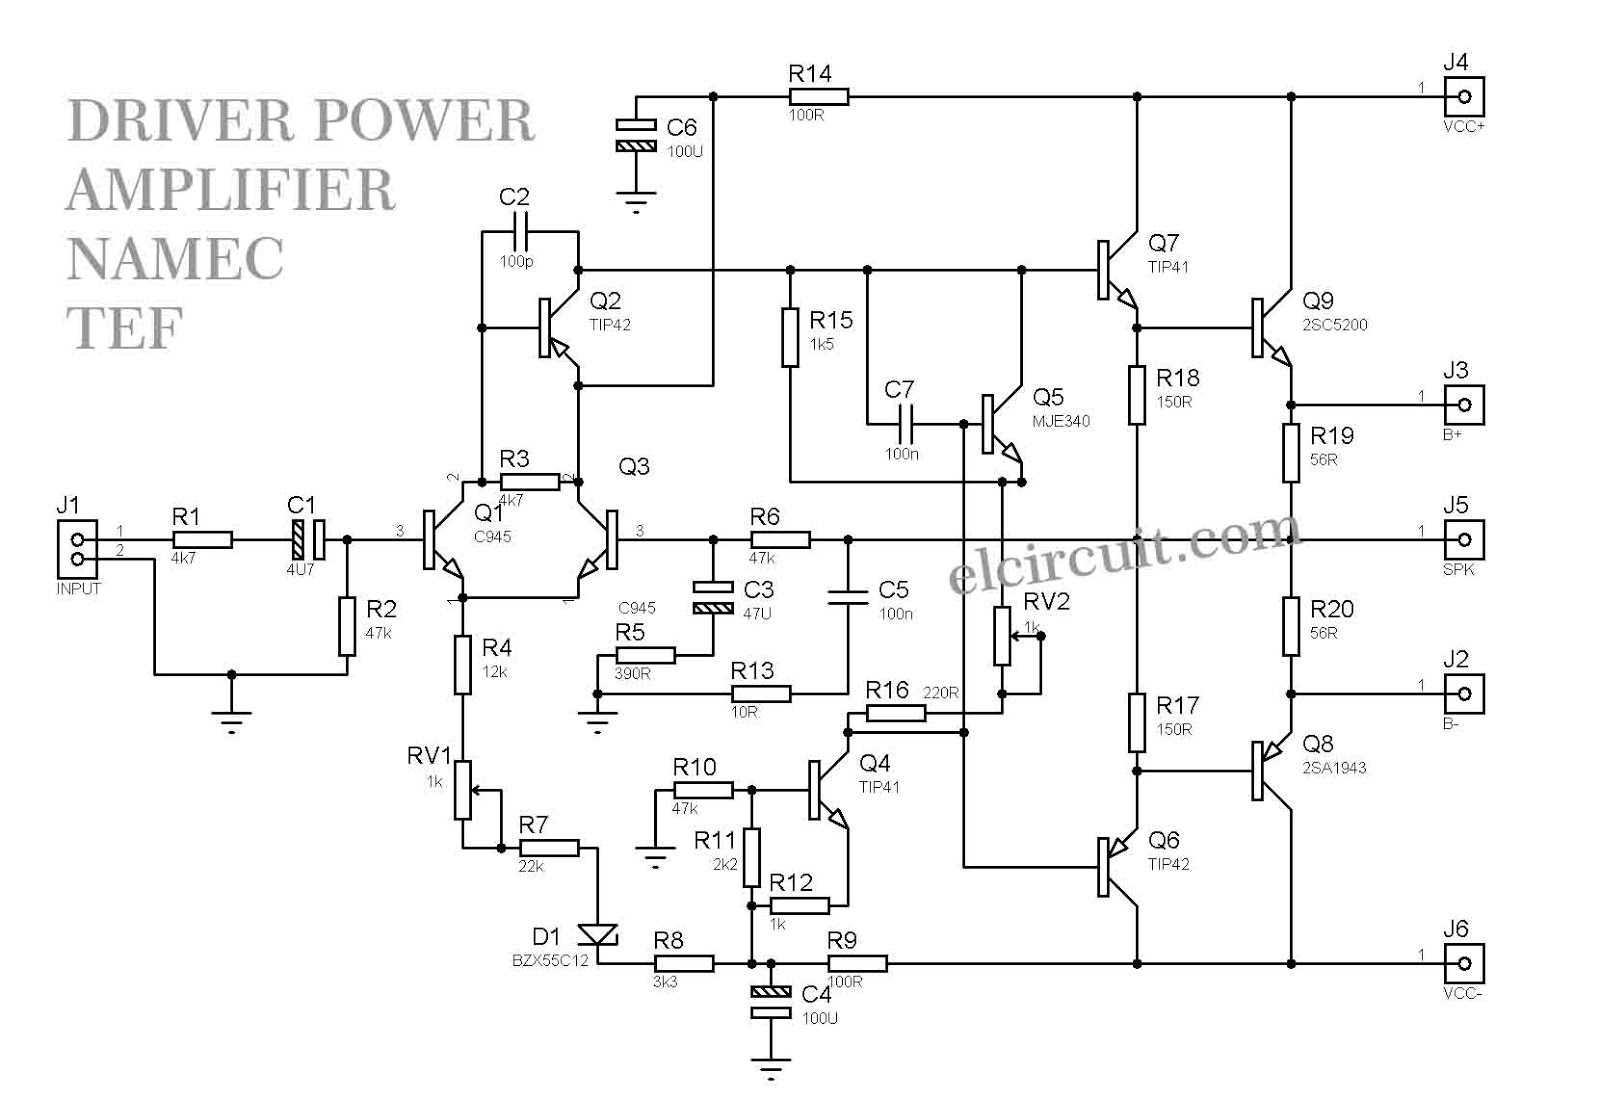 circuit diagram schematic driver power amplifier namec tef [ 1600 x 1099 Pixel ]